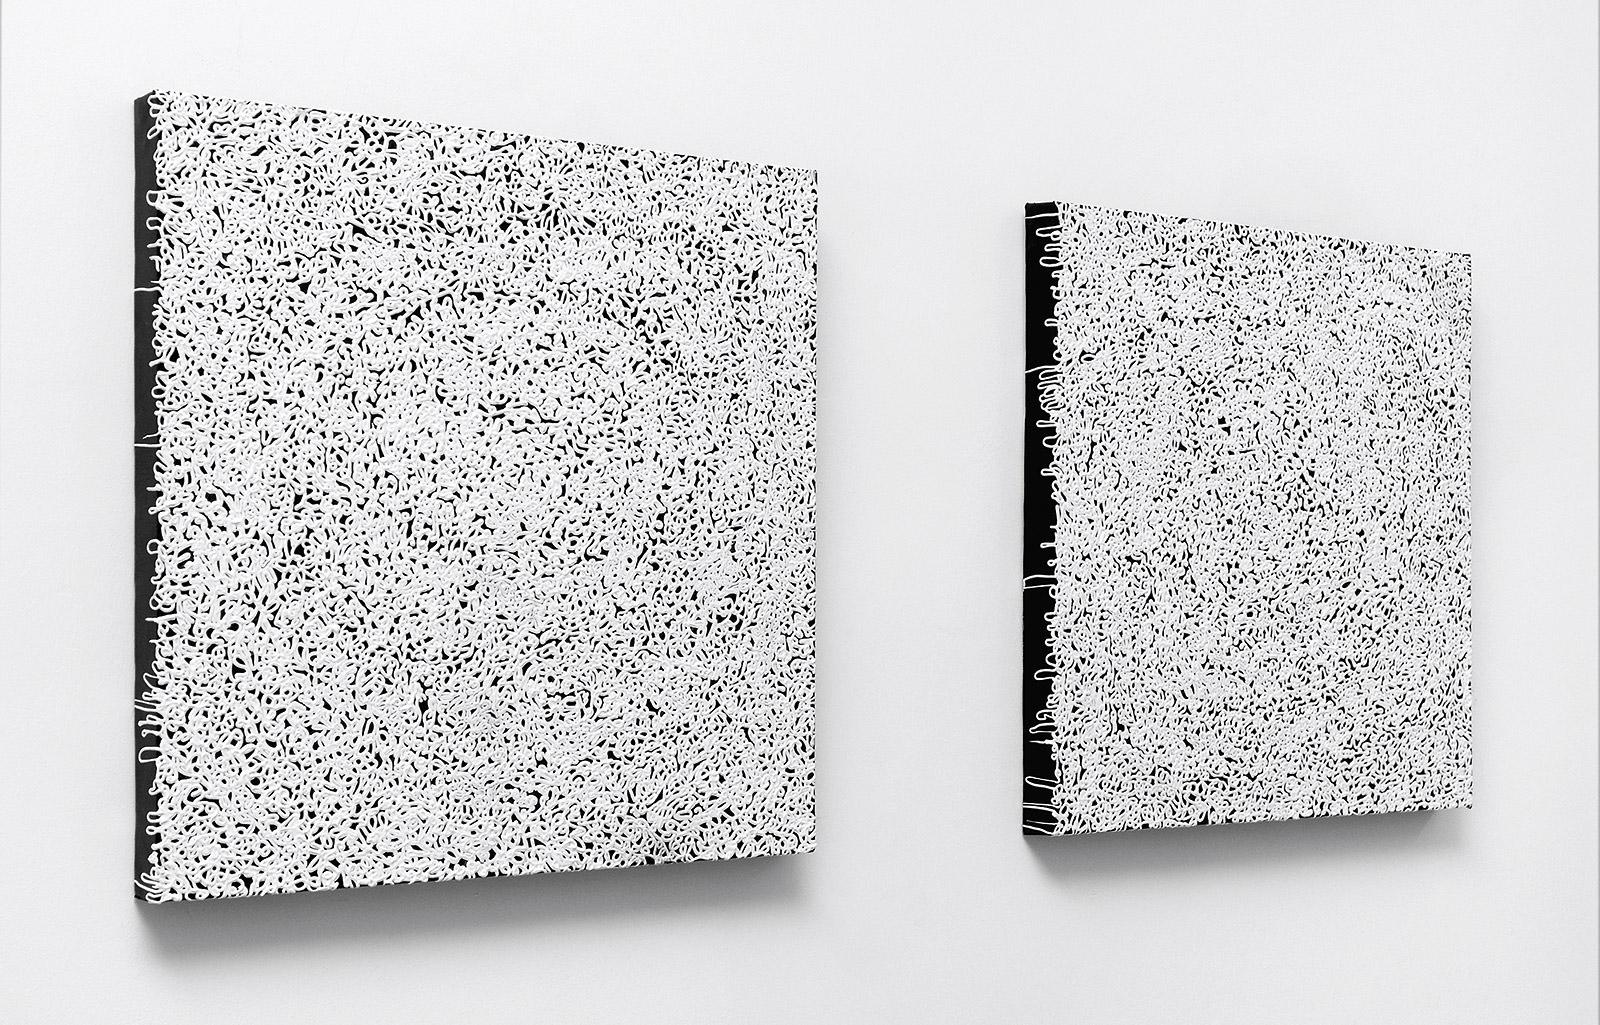 Oneliner (zebra), 2006, acrylic on canvas, á 50 x 50 cm